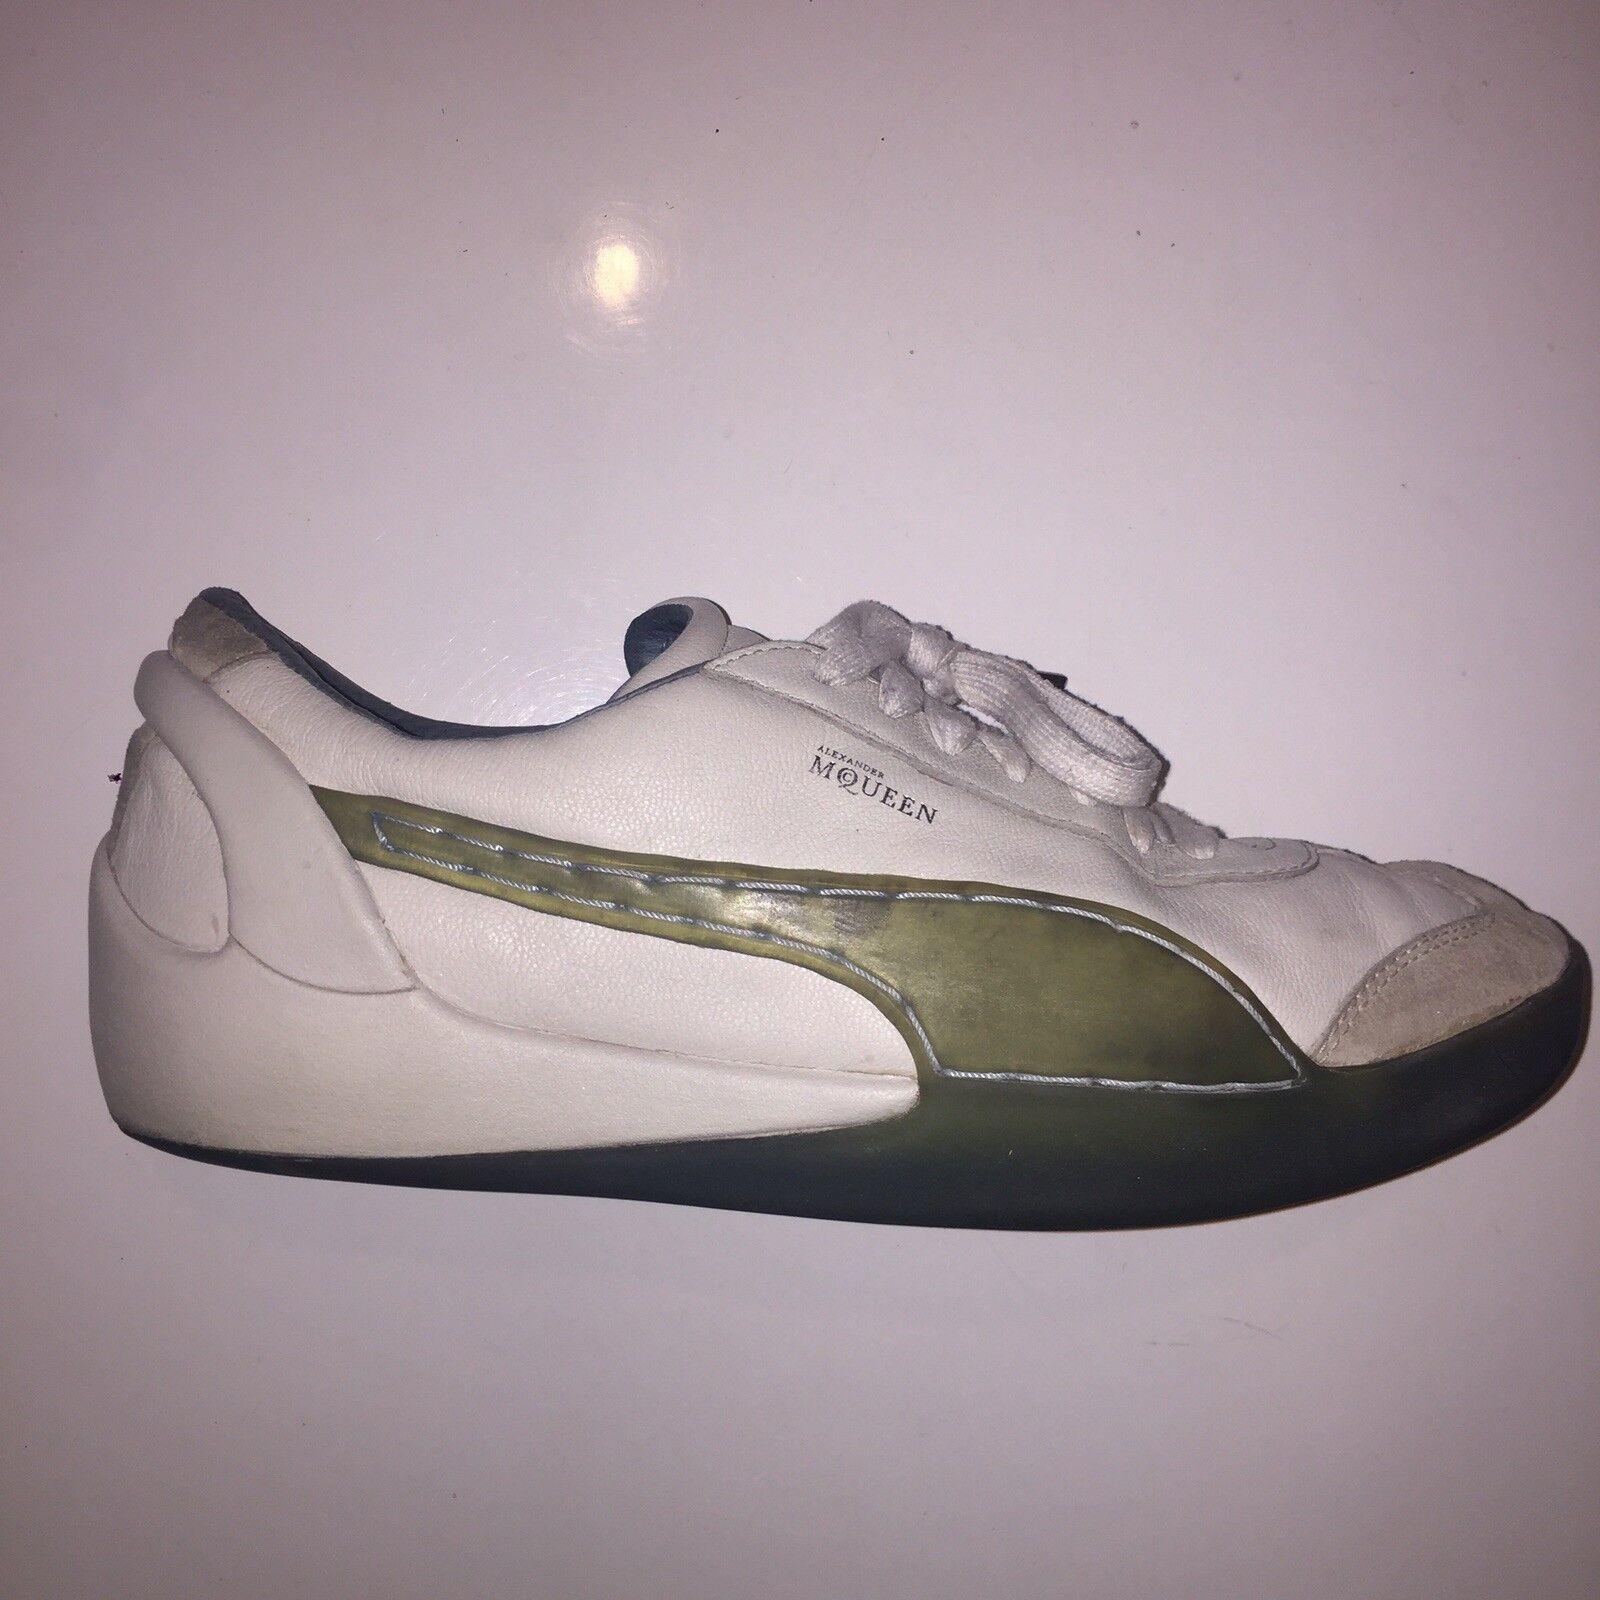 Alexander McQueen para hombre Puma blancoo Zapatillas Zapatos Talla 10